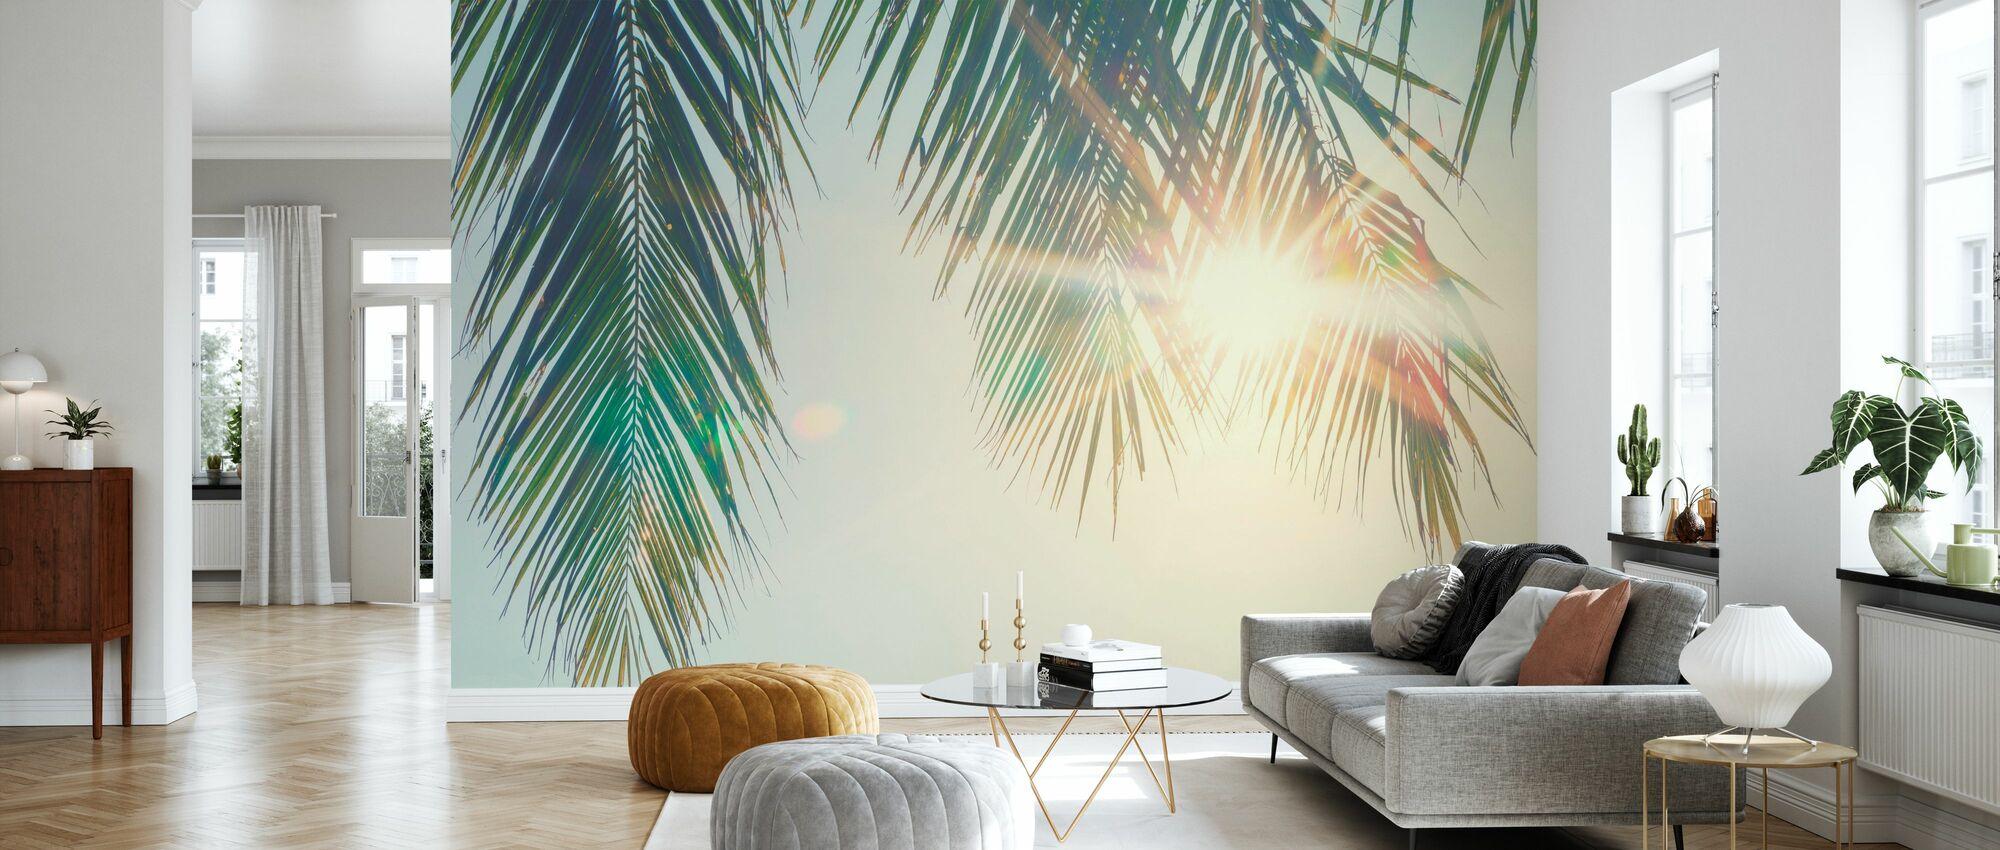 Palm blader solnedgang - Tapet - Stue